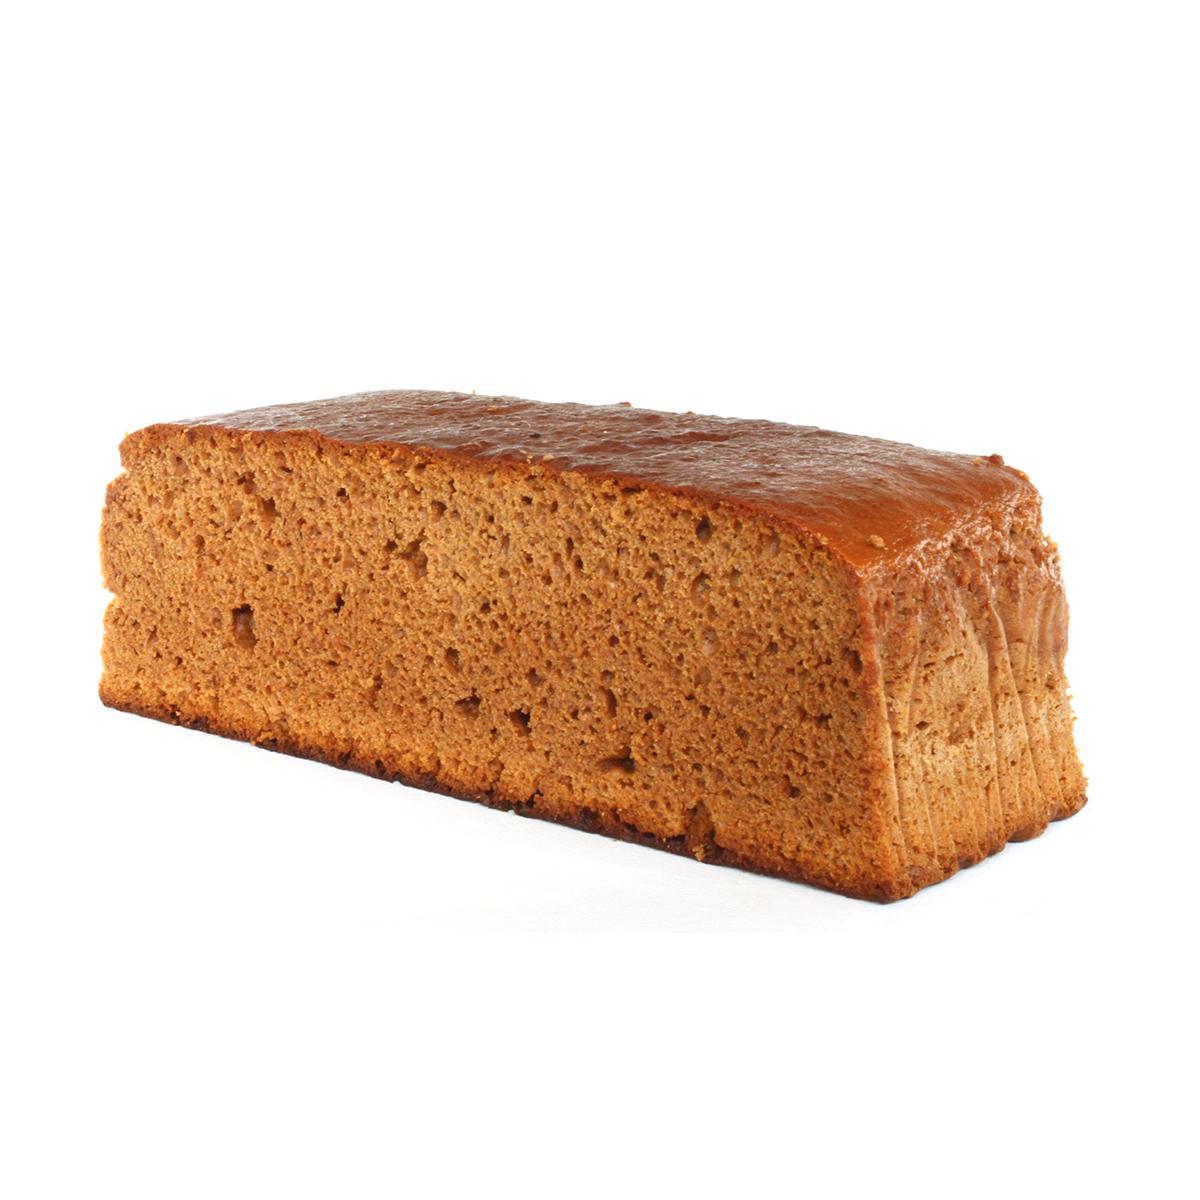 Ontbijtkoek